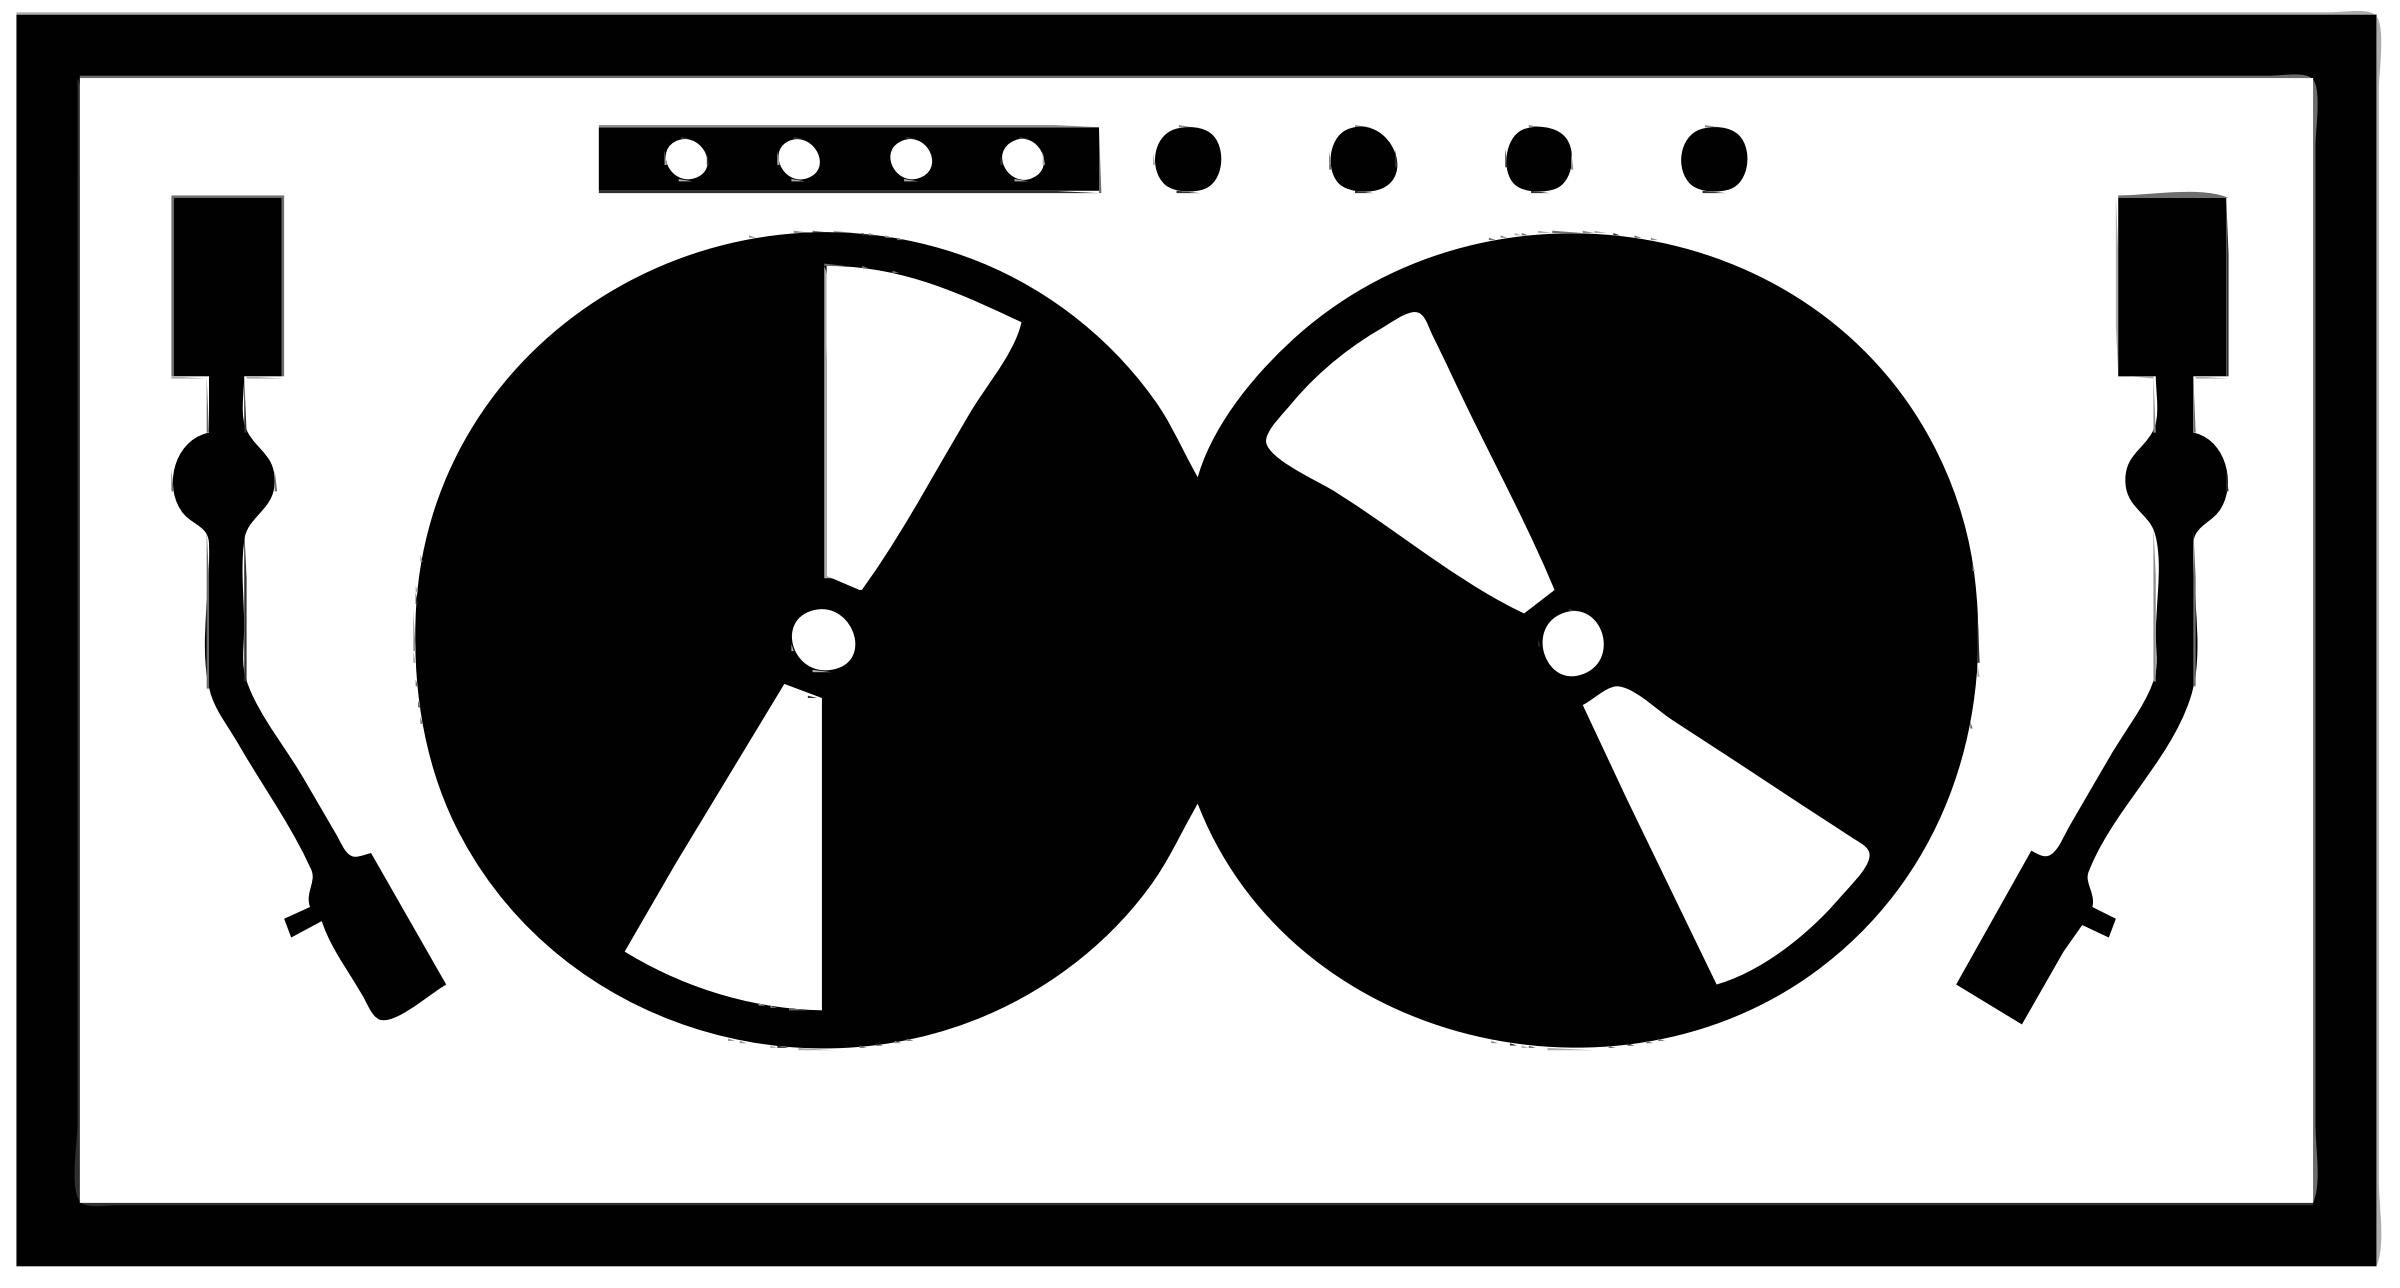 Free DJ Cliparts Black, Download Free Clip Art, Free Clip.